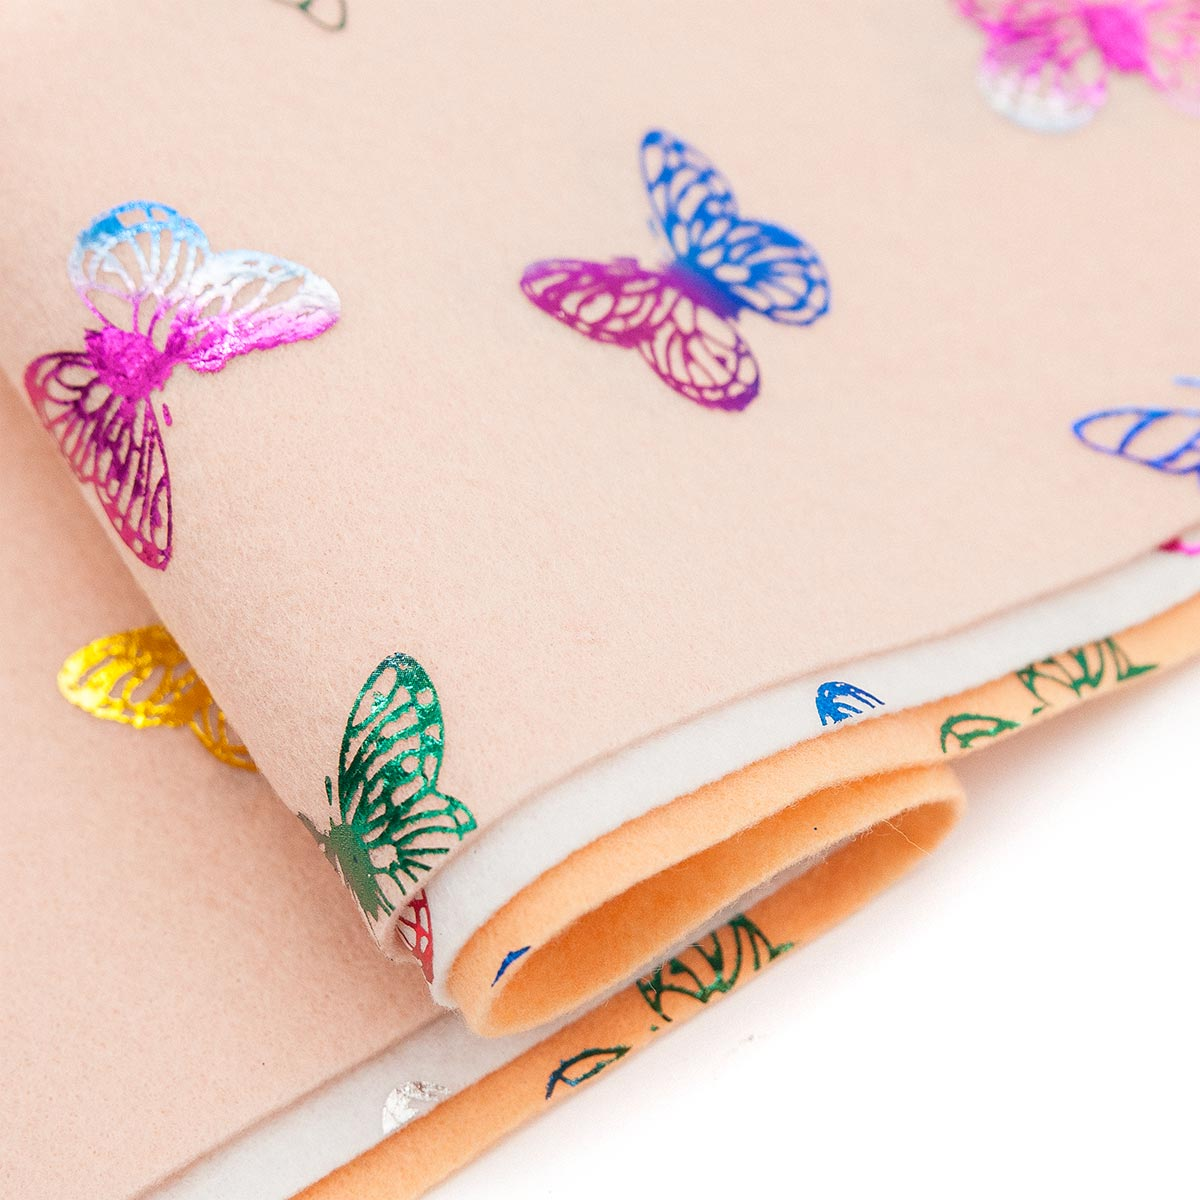 Фетр листовой декоративный 'Бабочки' Астра, 1,0мм, 180 гр, 20х30см, 3 шт/упак